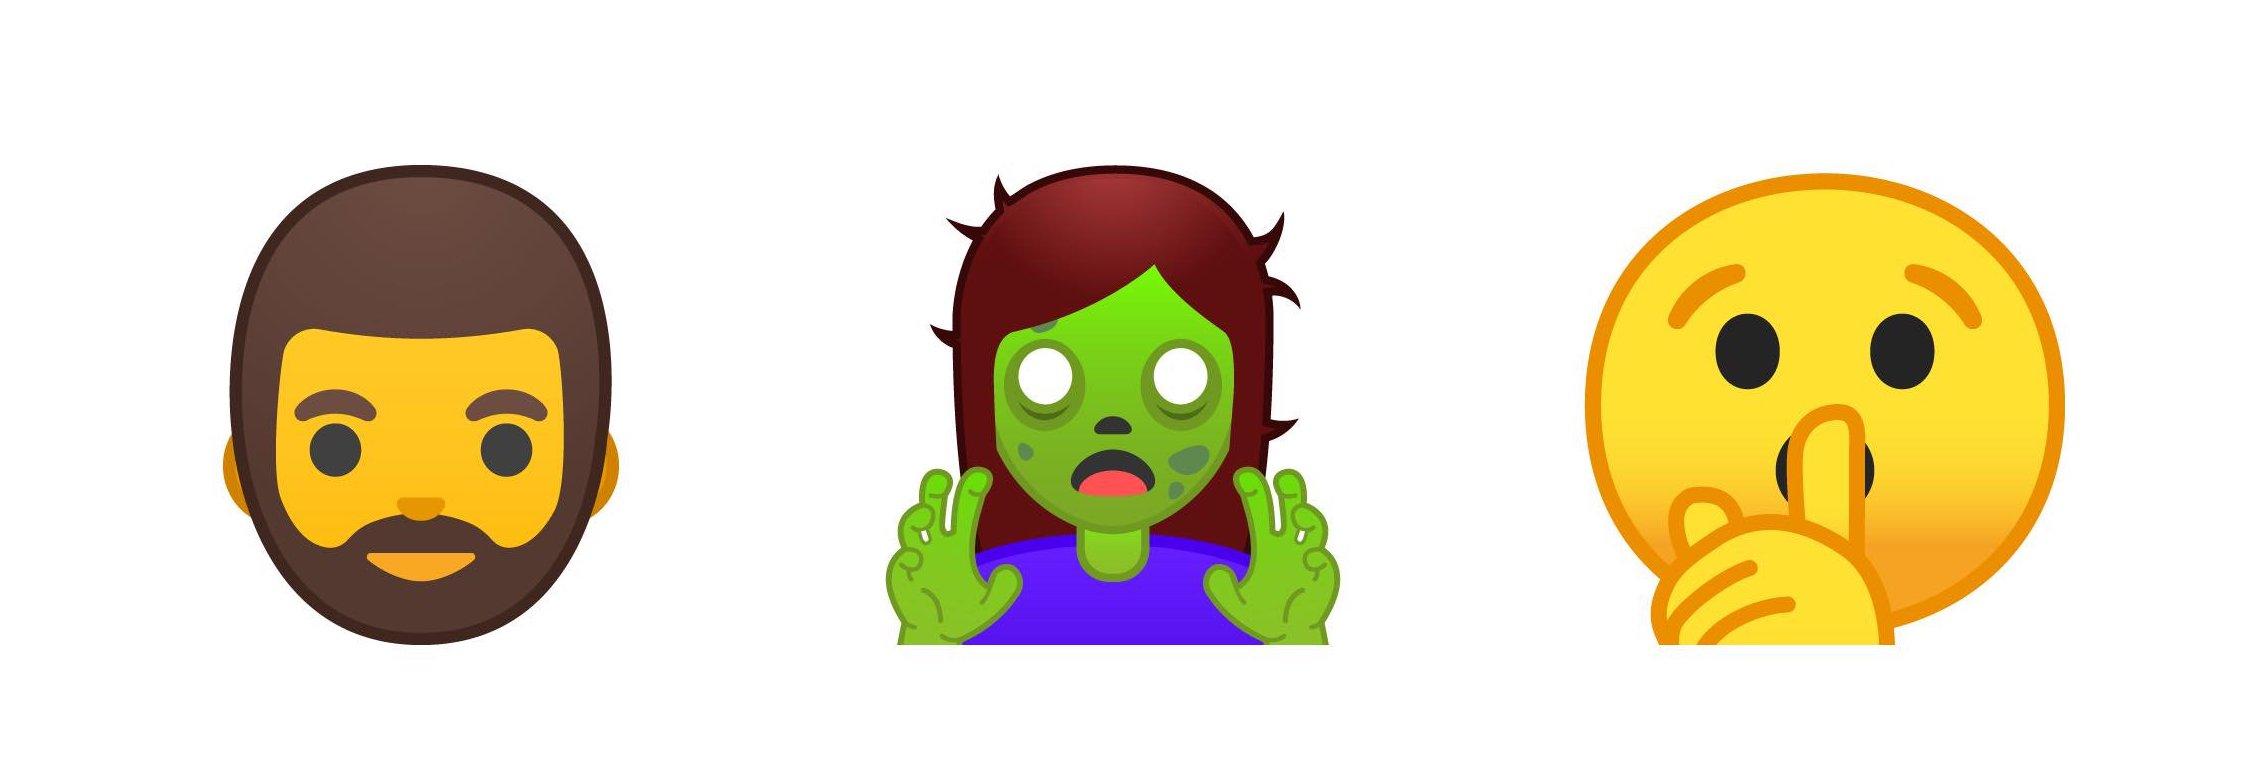 android-8-emojis-new-emojipedia-1